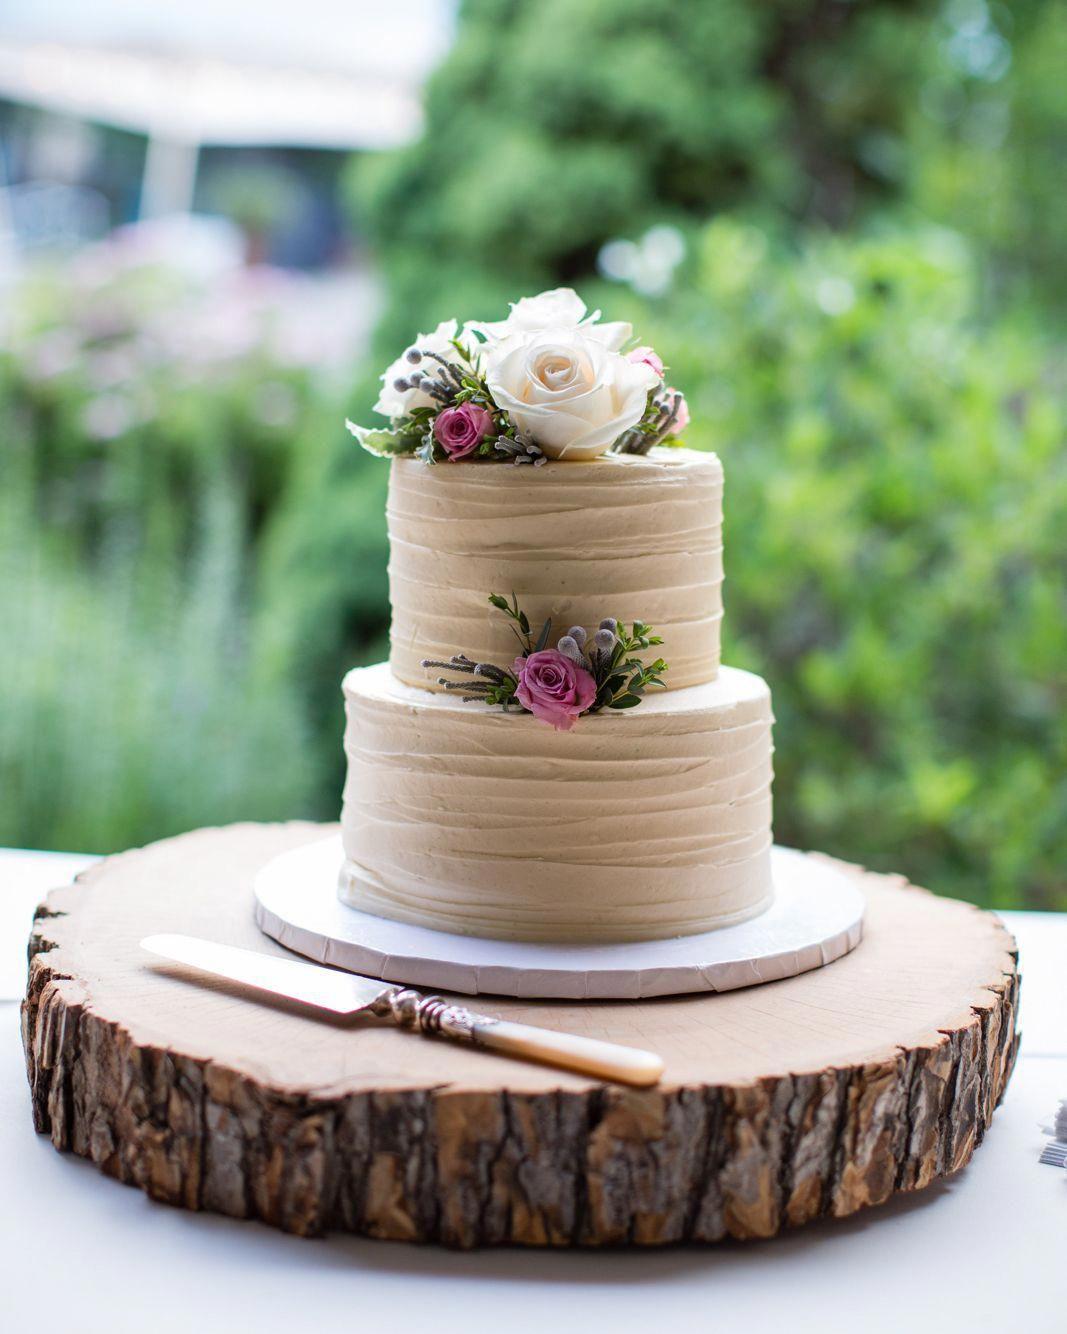 Buttercream beige wedding cake Romantic wedding cake